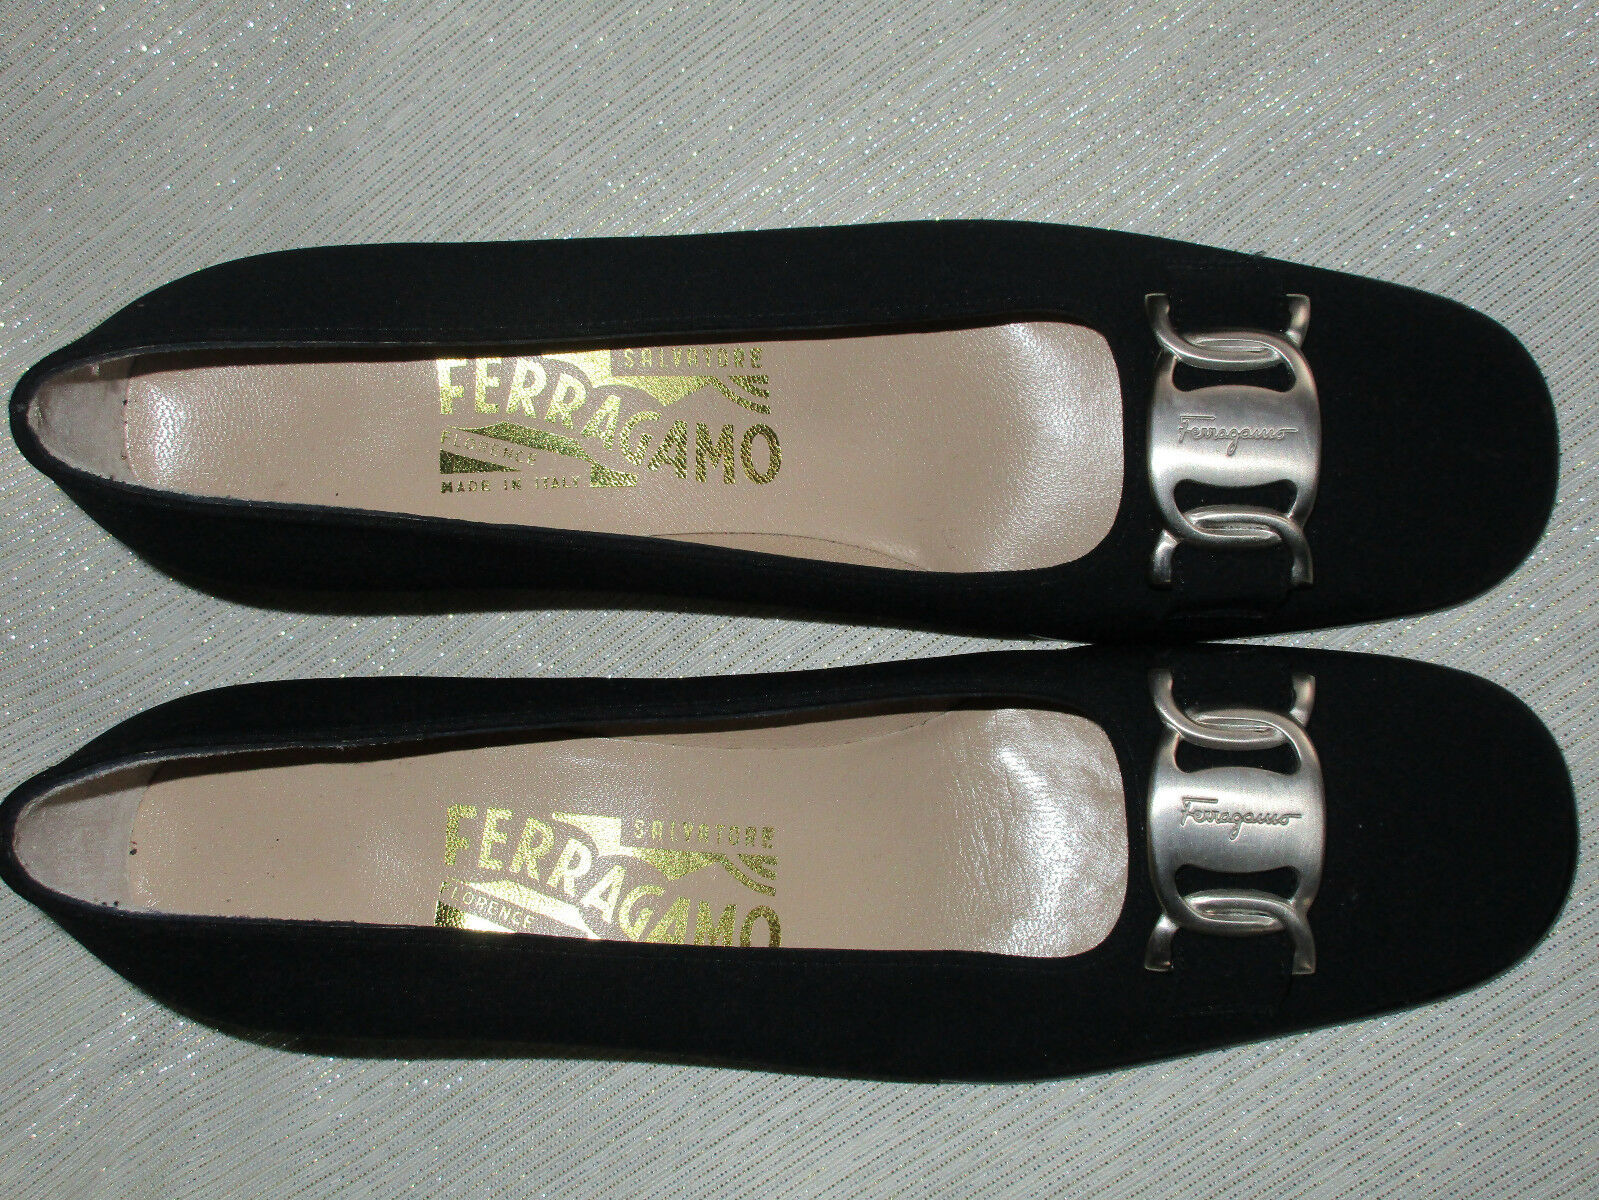 Salvatore Ferragamo Vara Tissu Classique Pompe Logo Argenté Boucle Neuf 6 AAA noir